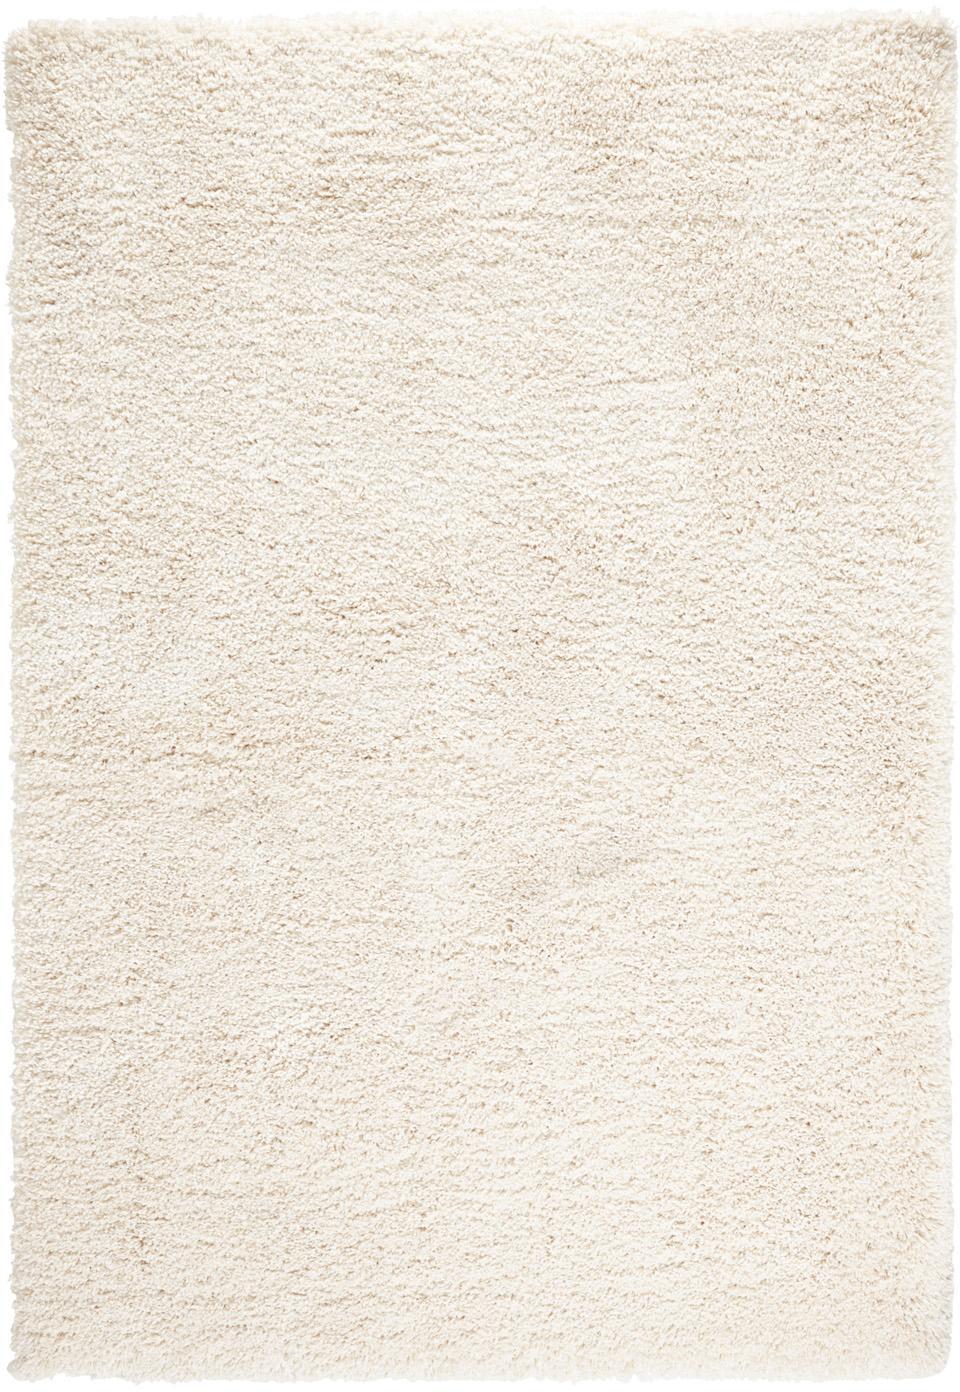 Flauschiger Hochflor-Teppich Venice in Creme, Flor: 100% Polypropylen, Creme, B 80 x L 150 cm (Grösse XS)